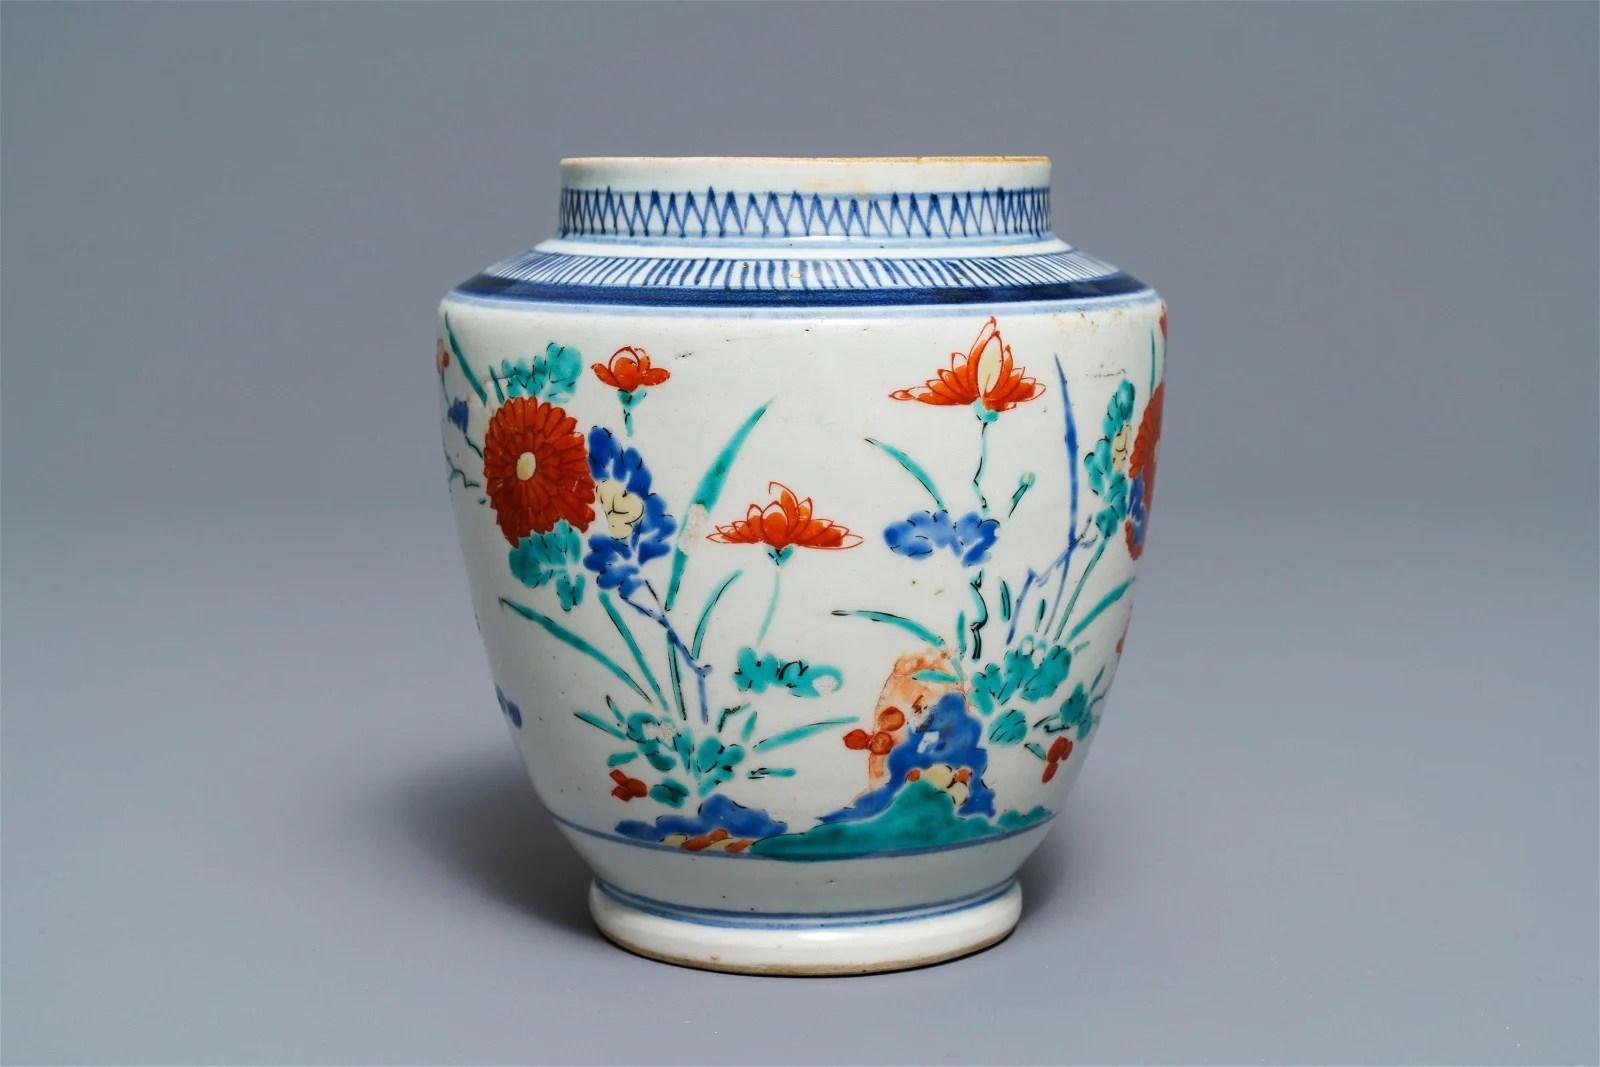 A polychrome Japanese Kakiemon vase with floral design,